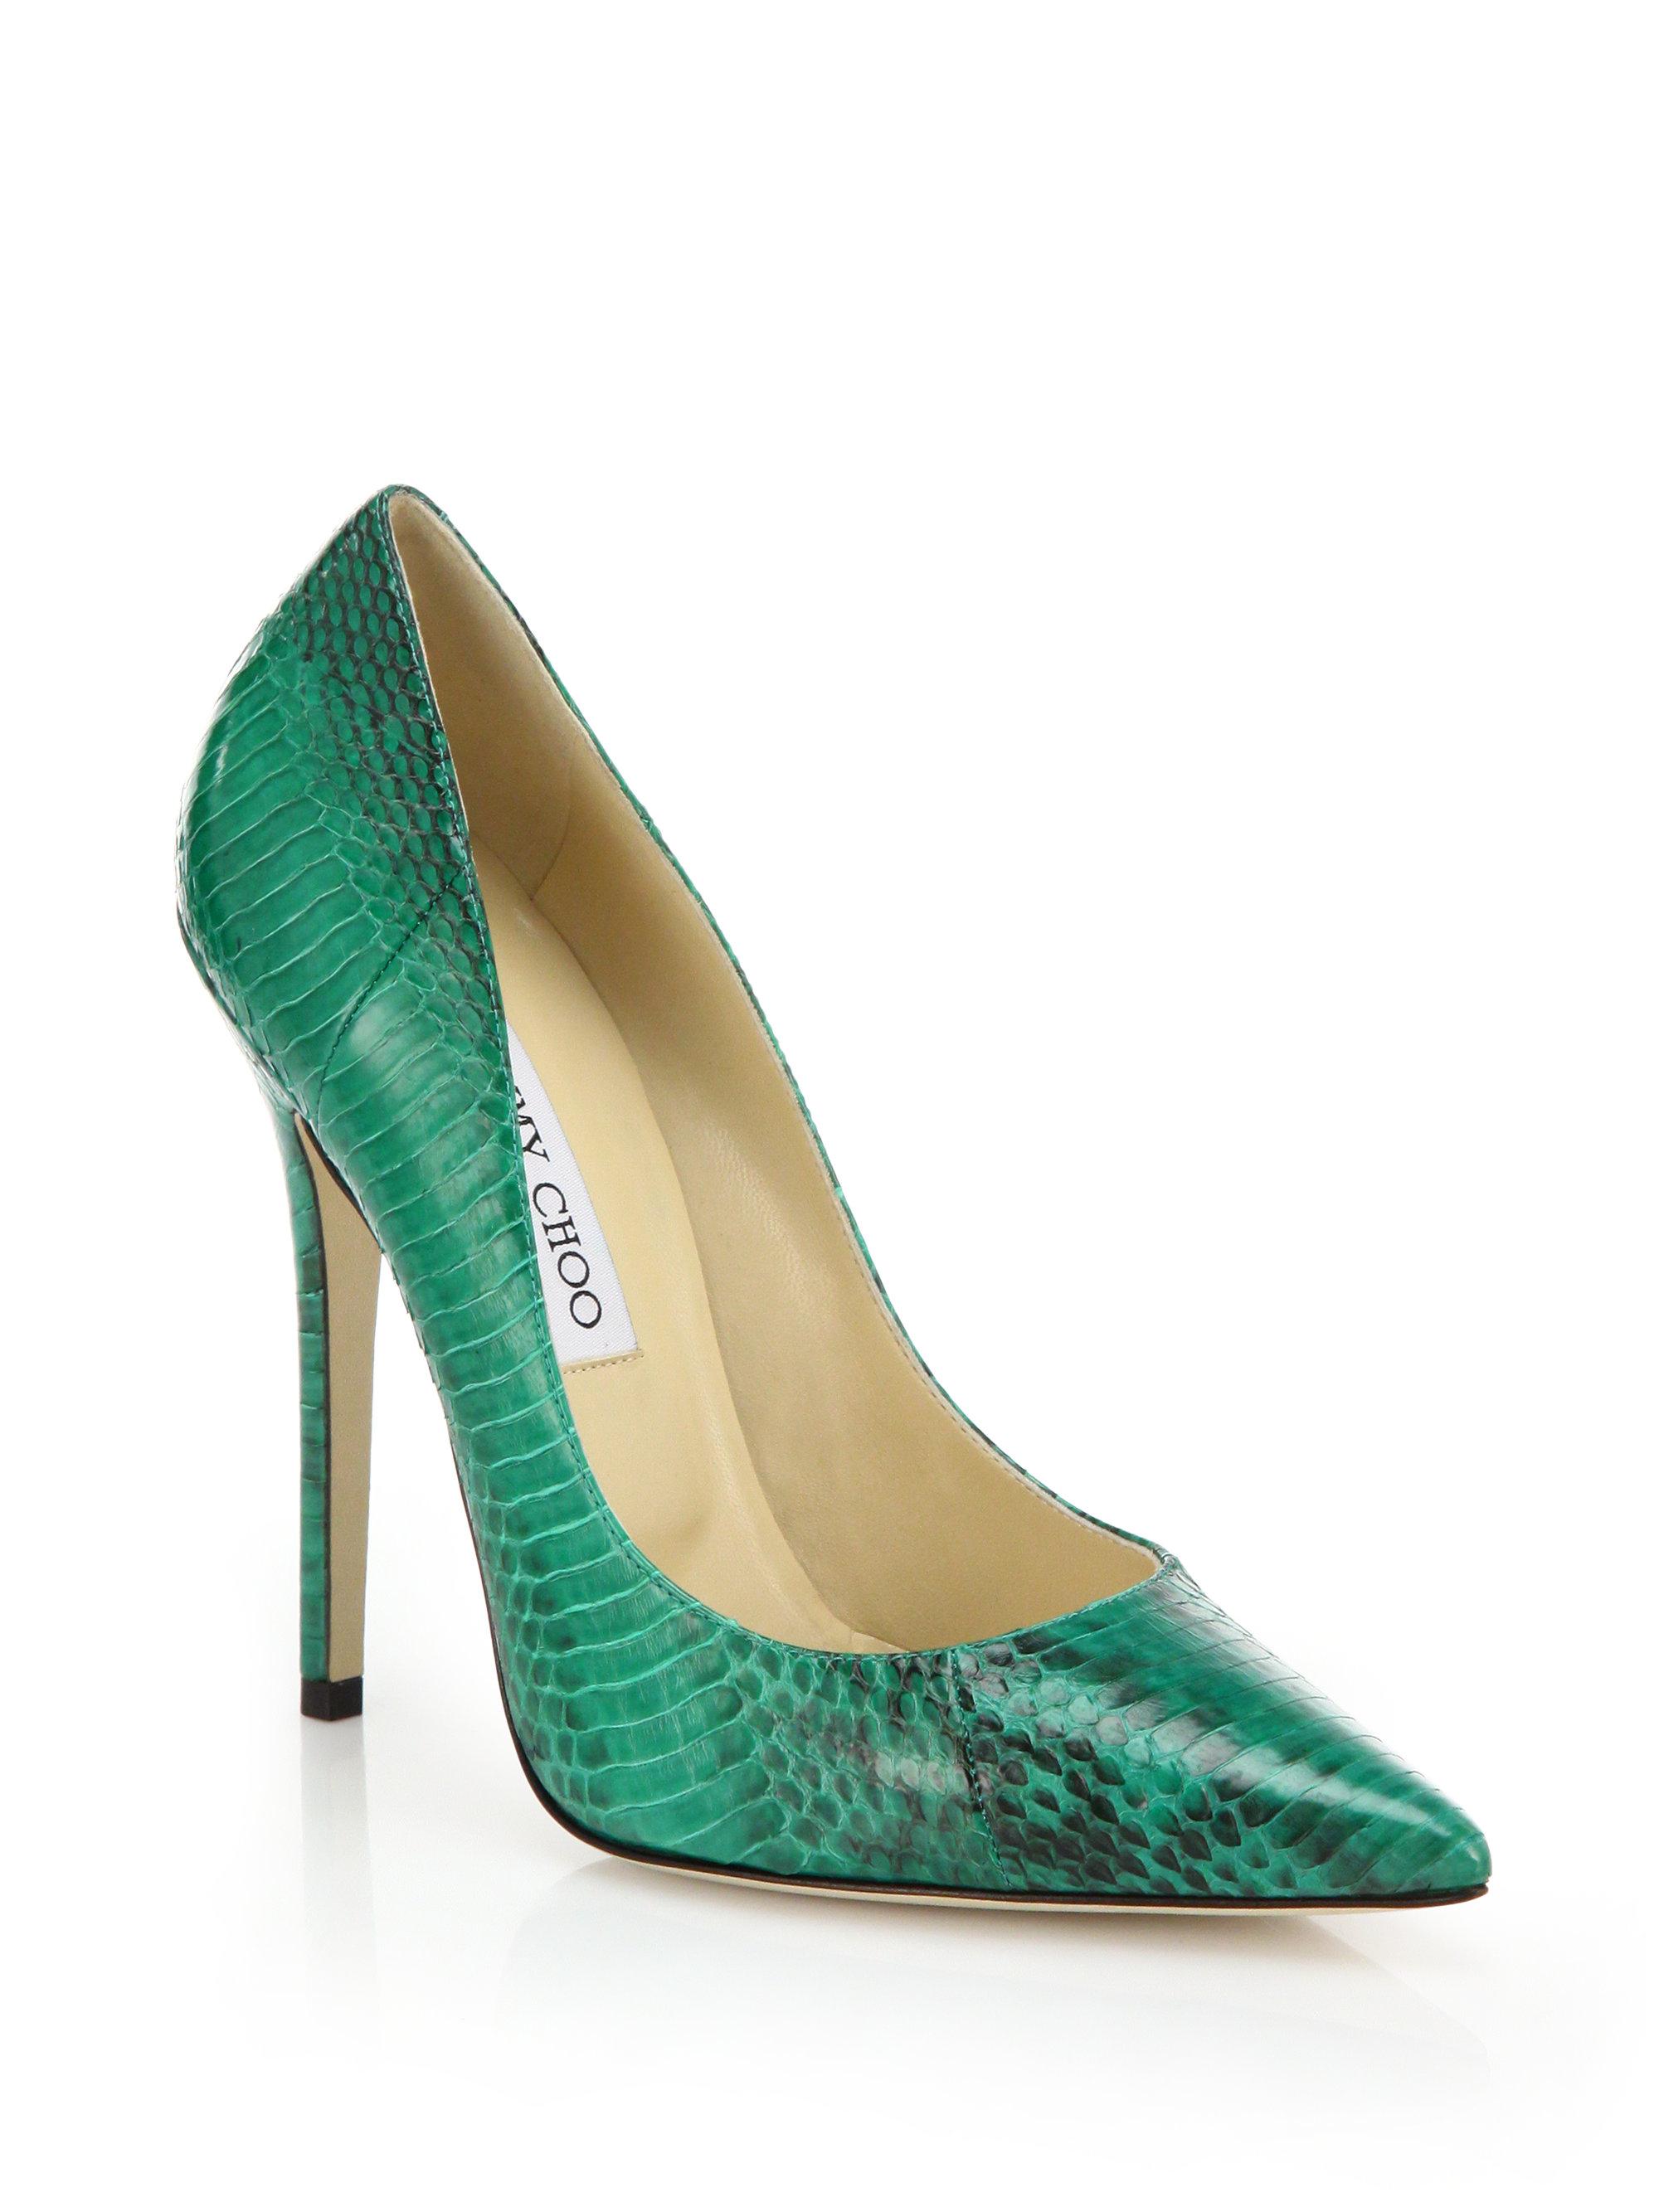 Jimmy Choo Anouk Snakeskin Pointed Toe Pumps In Green Lyst